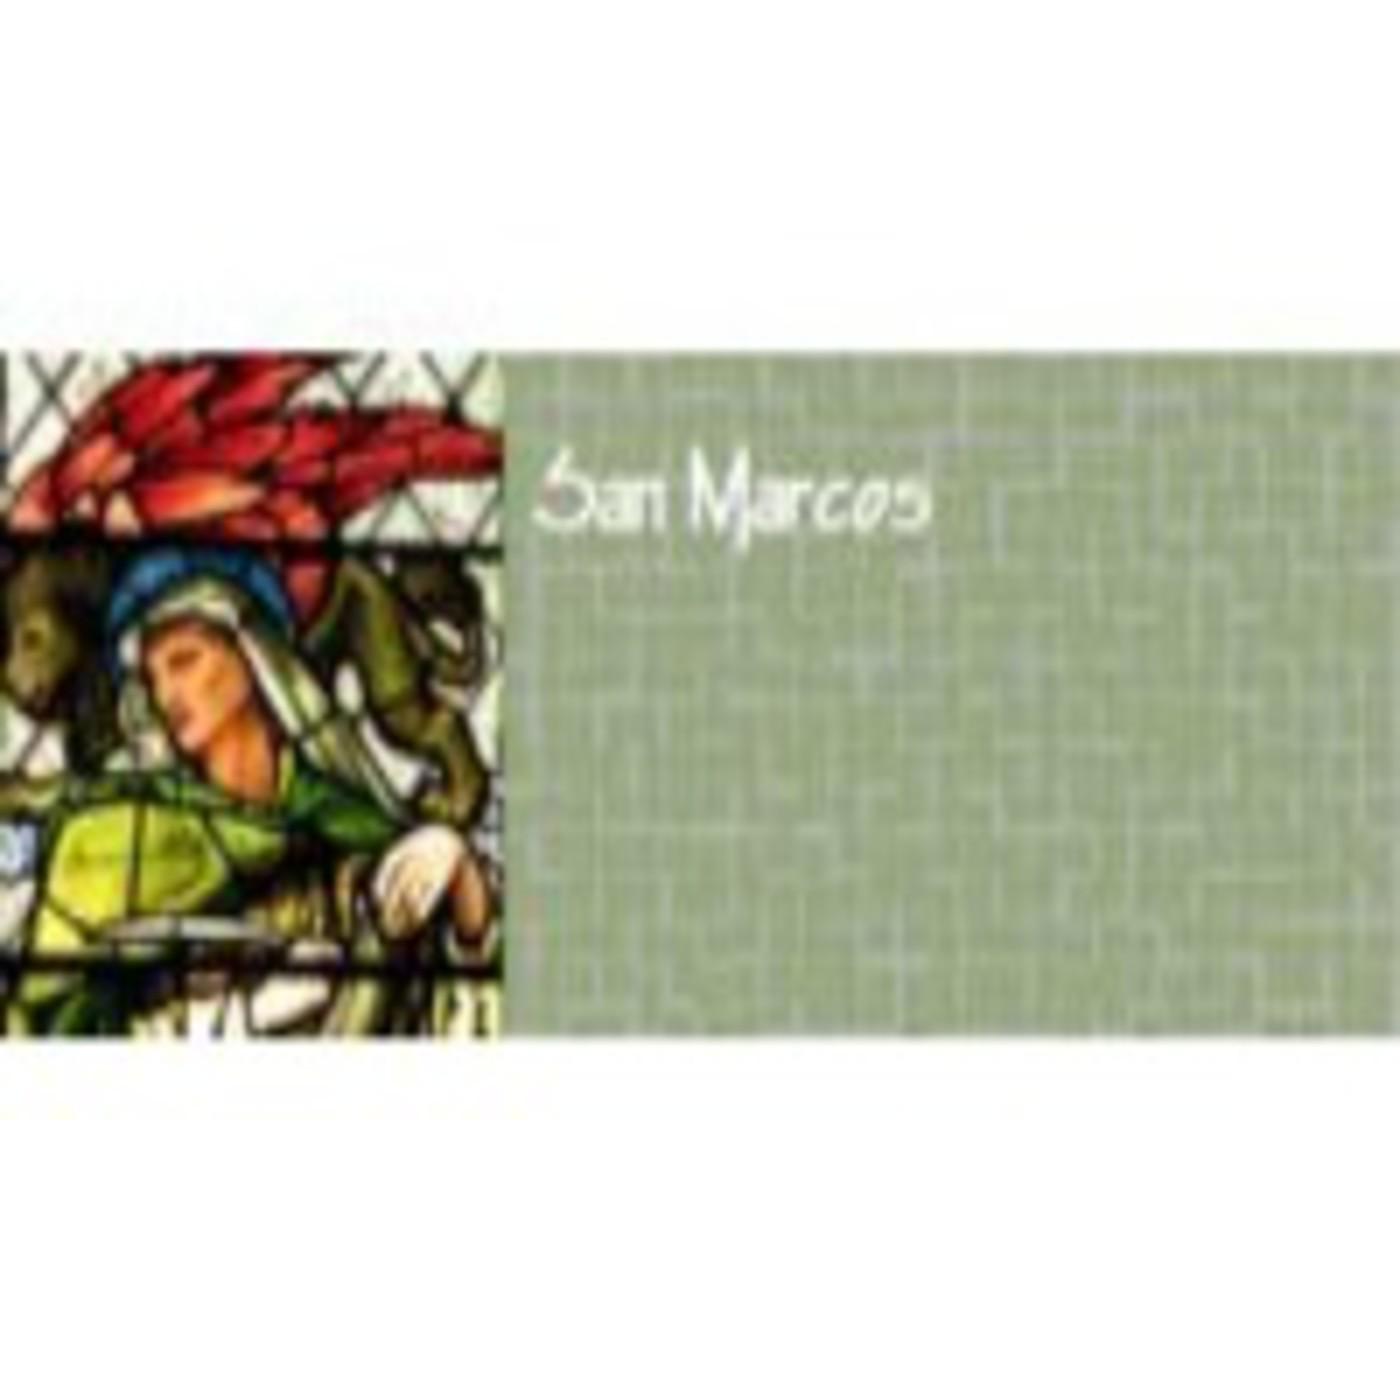 Escucha Evangelio según San Marcos - iVoox